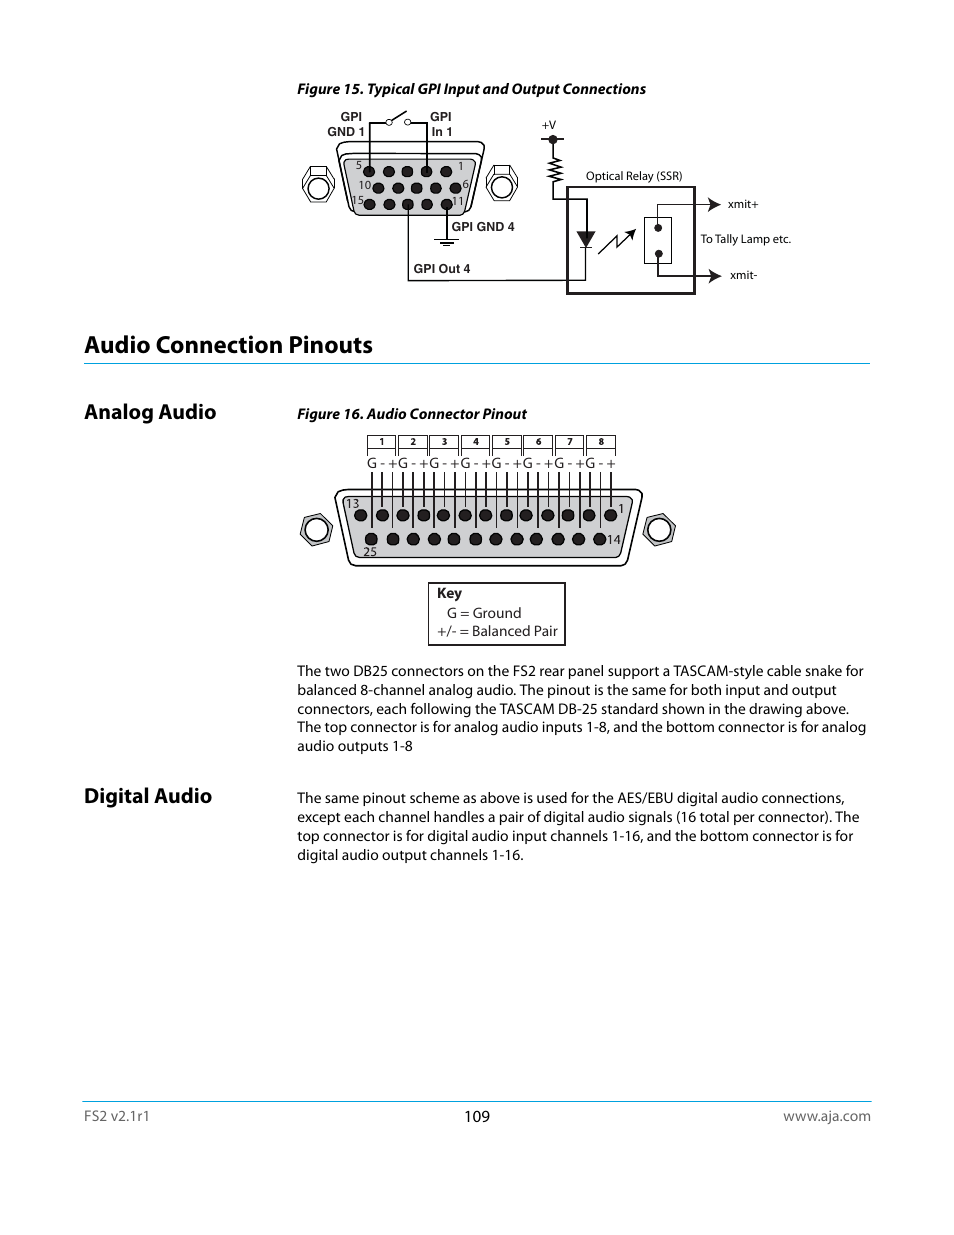 Audio connection pinouts, Analog audio, Digital audio | AJA FS2 ...